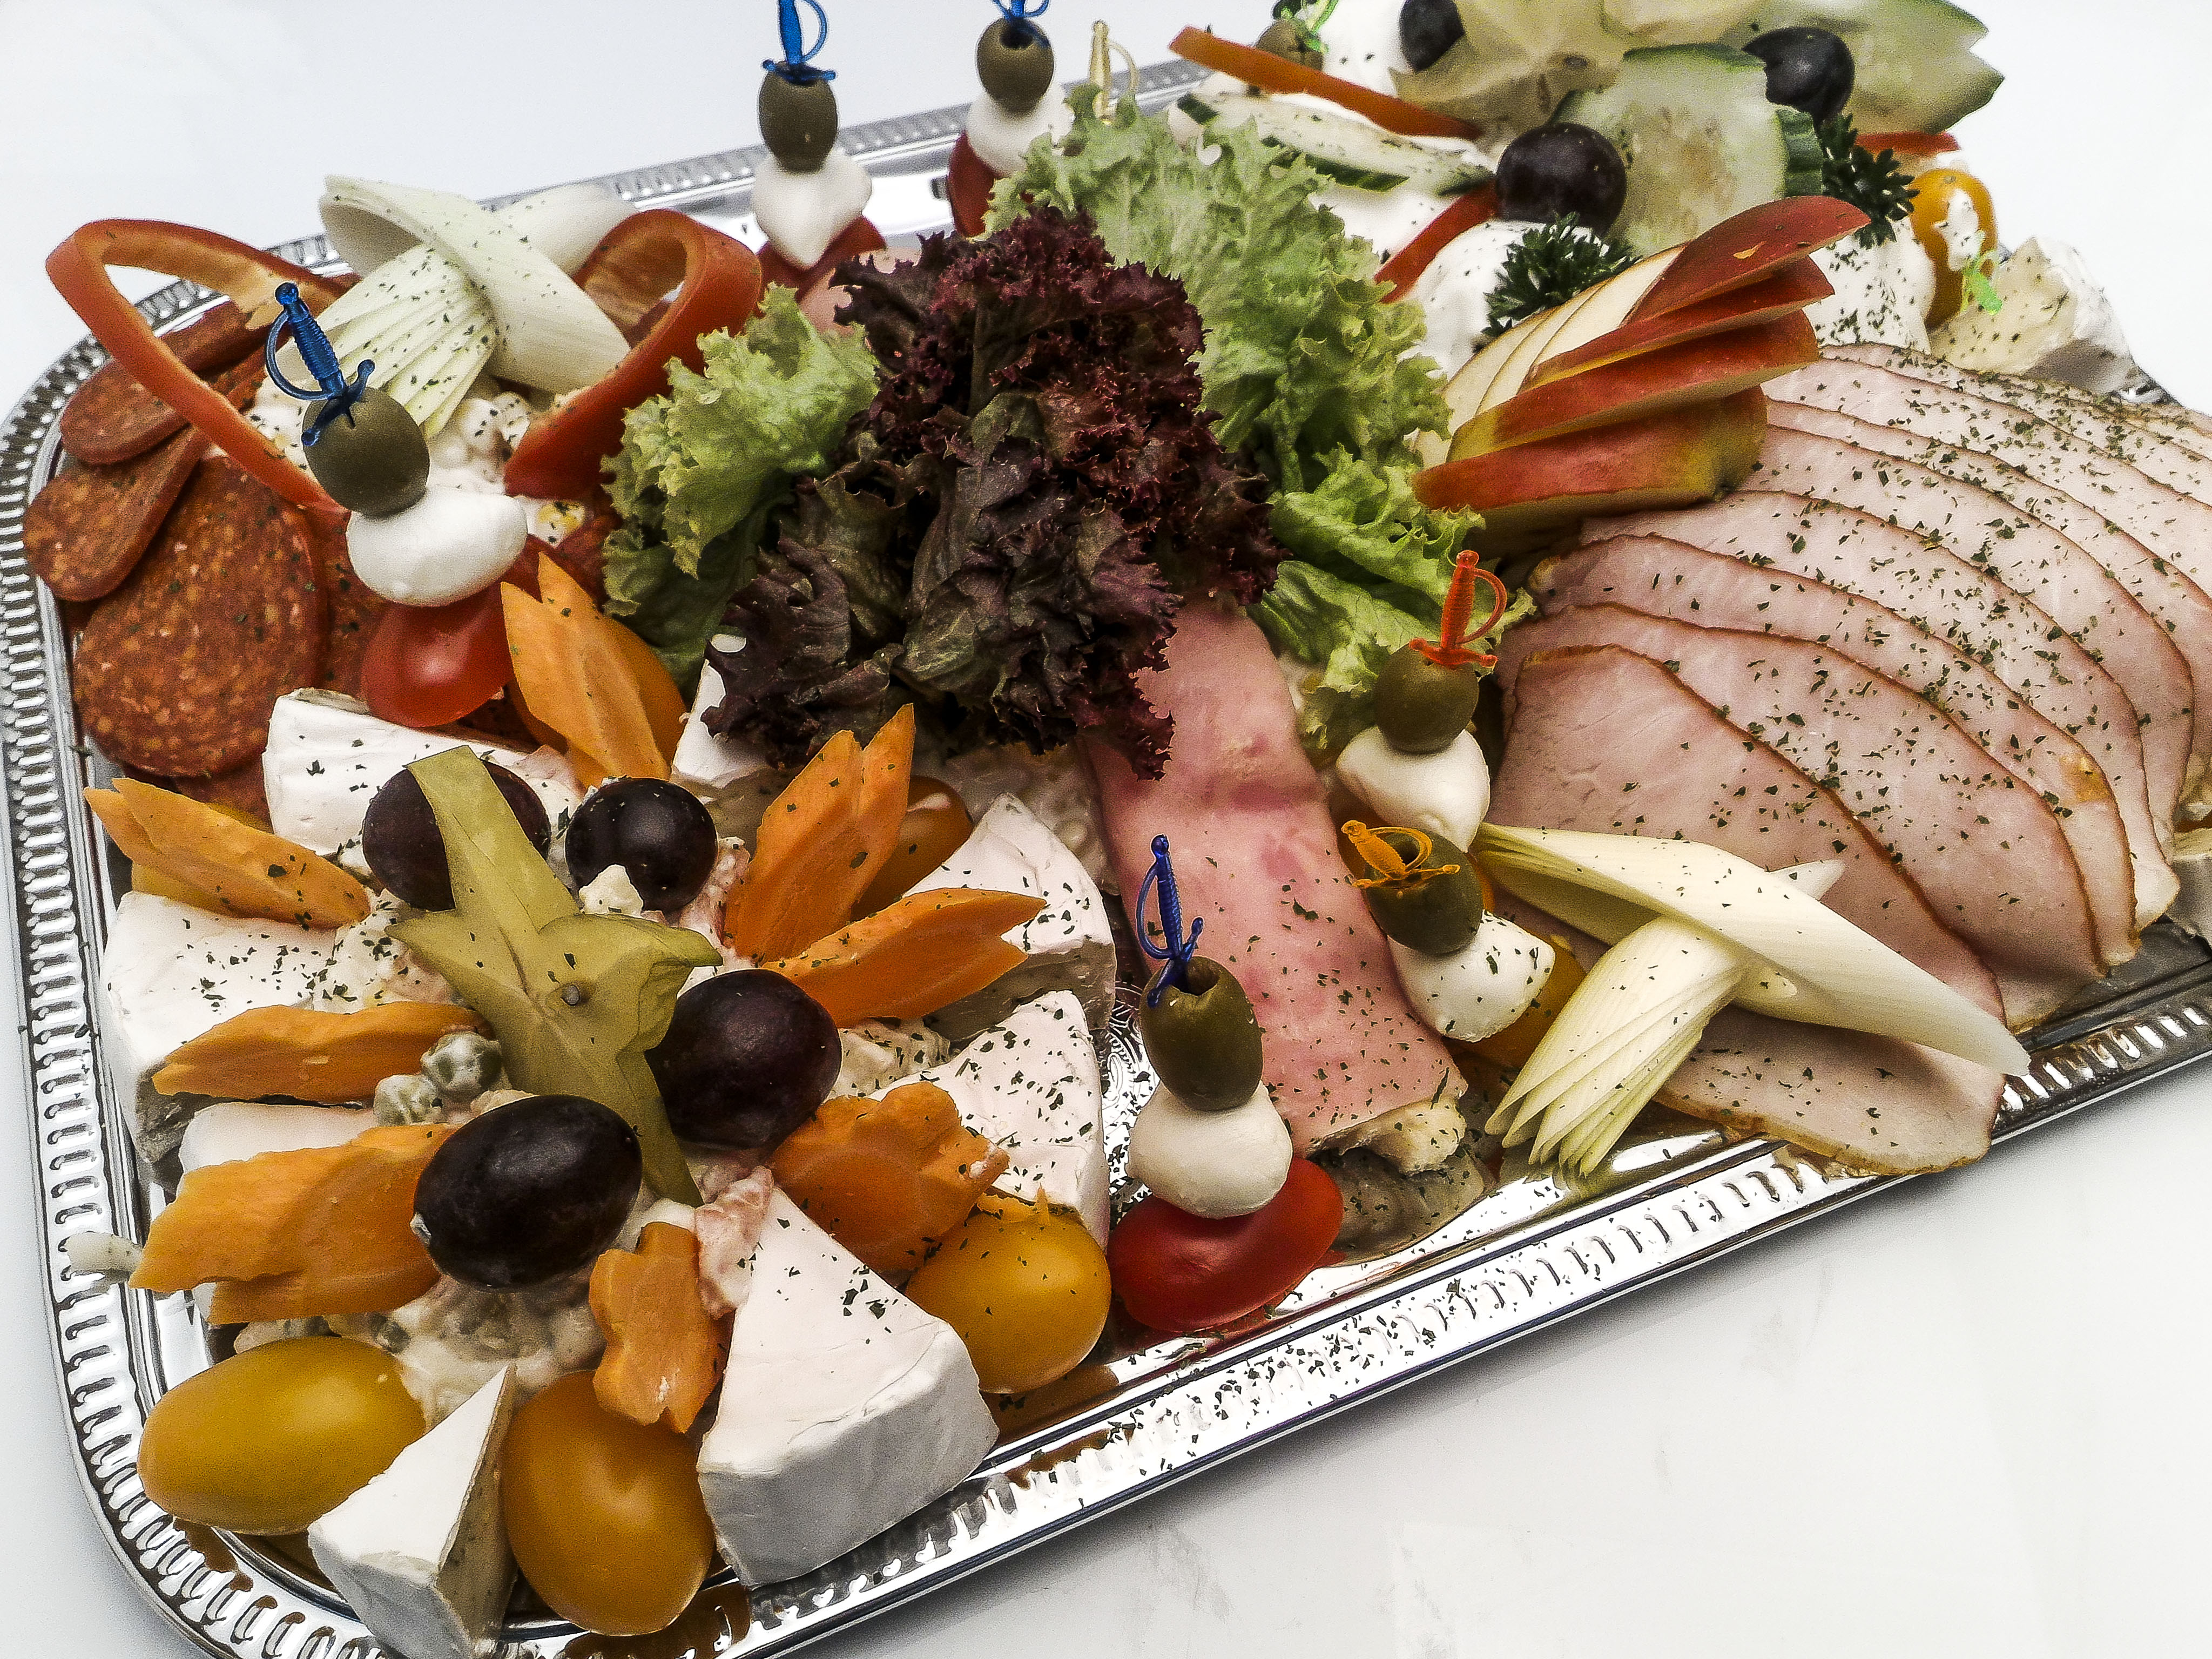 A Nexit Gastro termékei